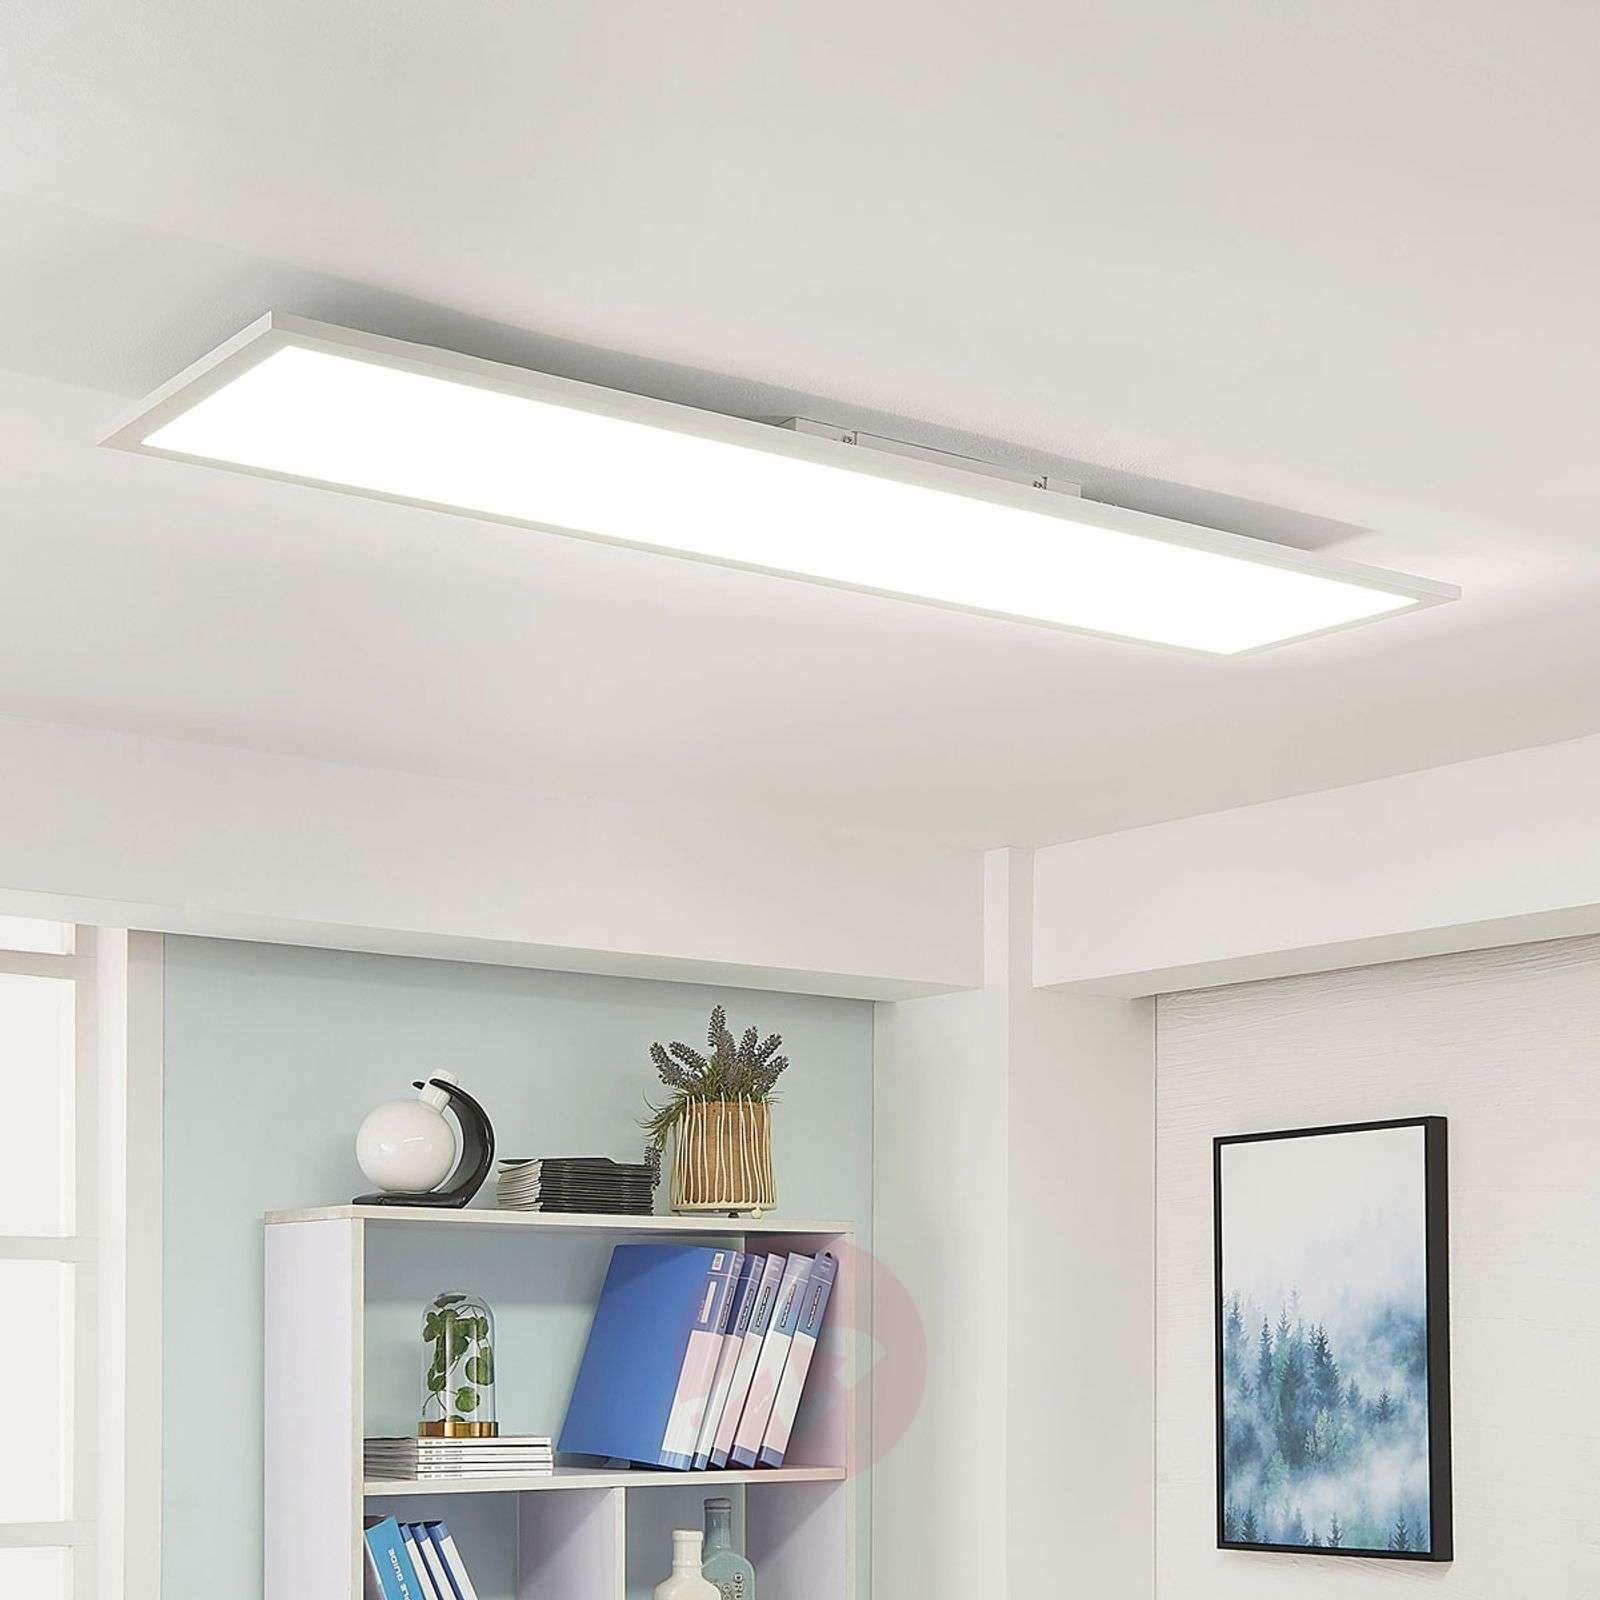 Lysander white LED ceiling light, dimmable-9621560-01